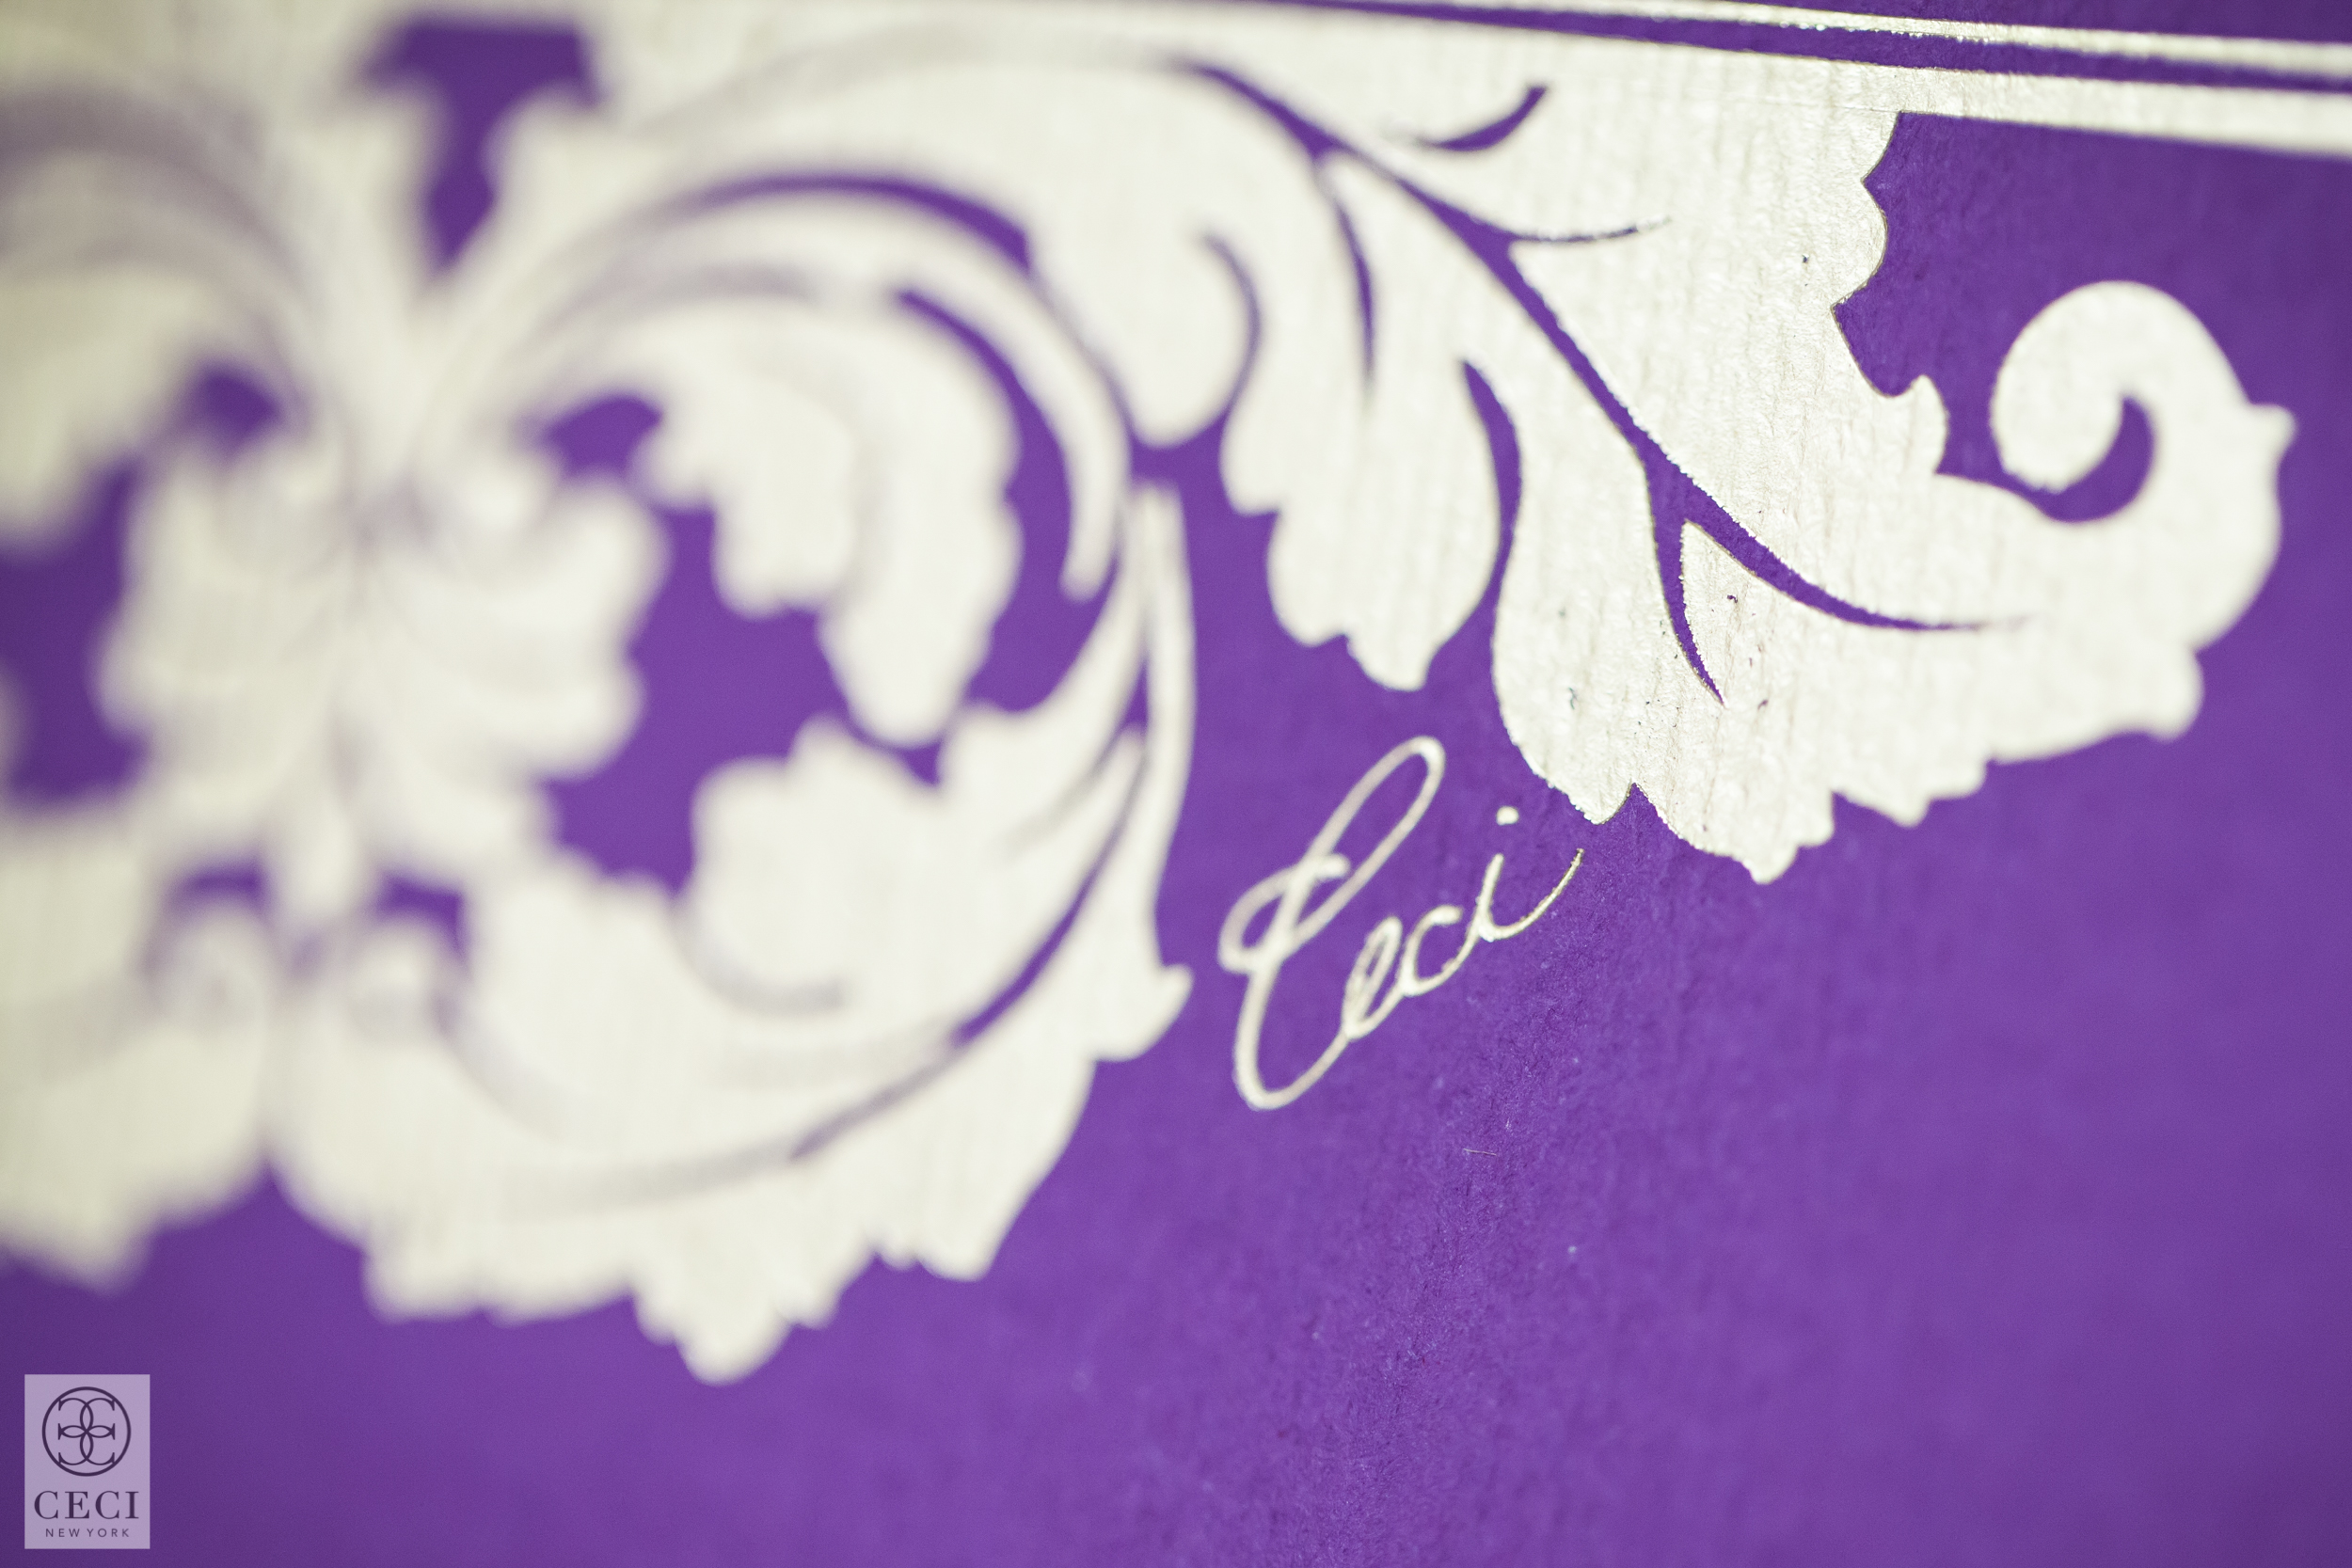 ceci_new_york_lucas_somoza_purple_regal_wediding_birthday_commitment_ceremony_gold-3.jpg